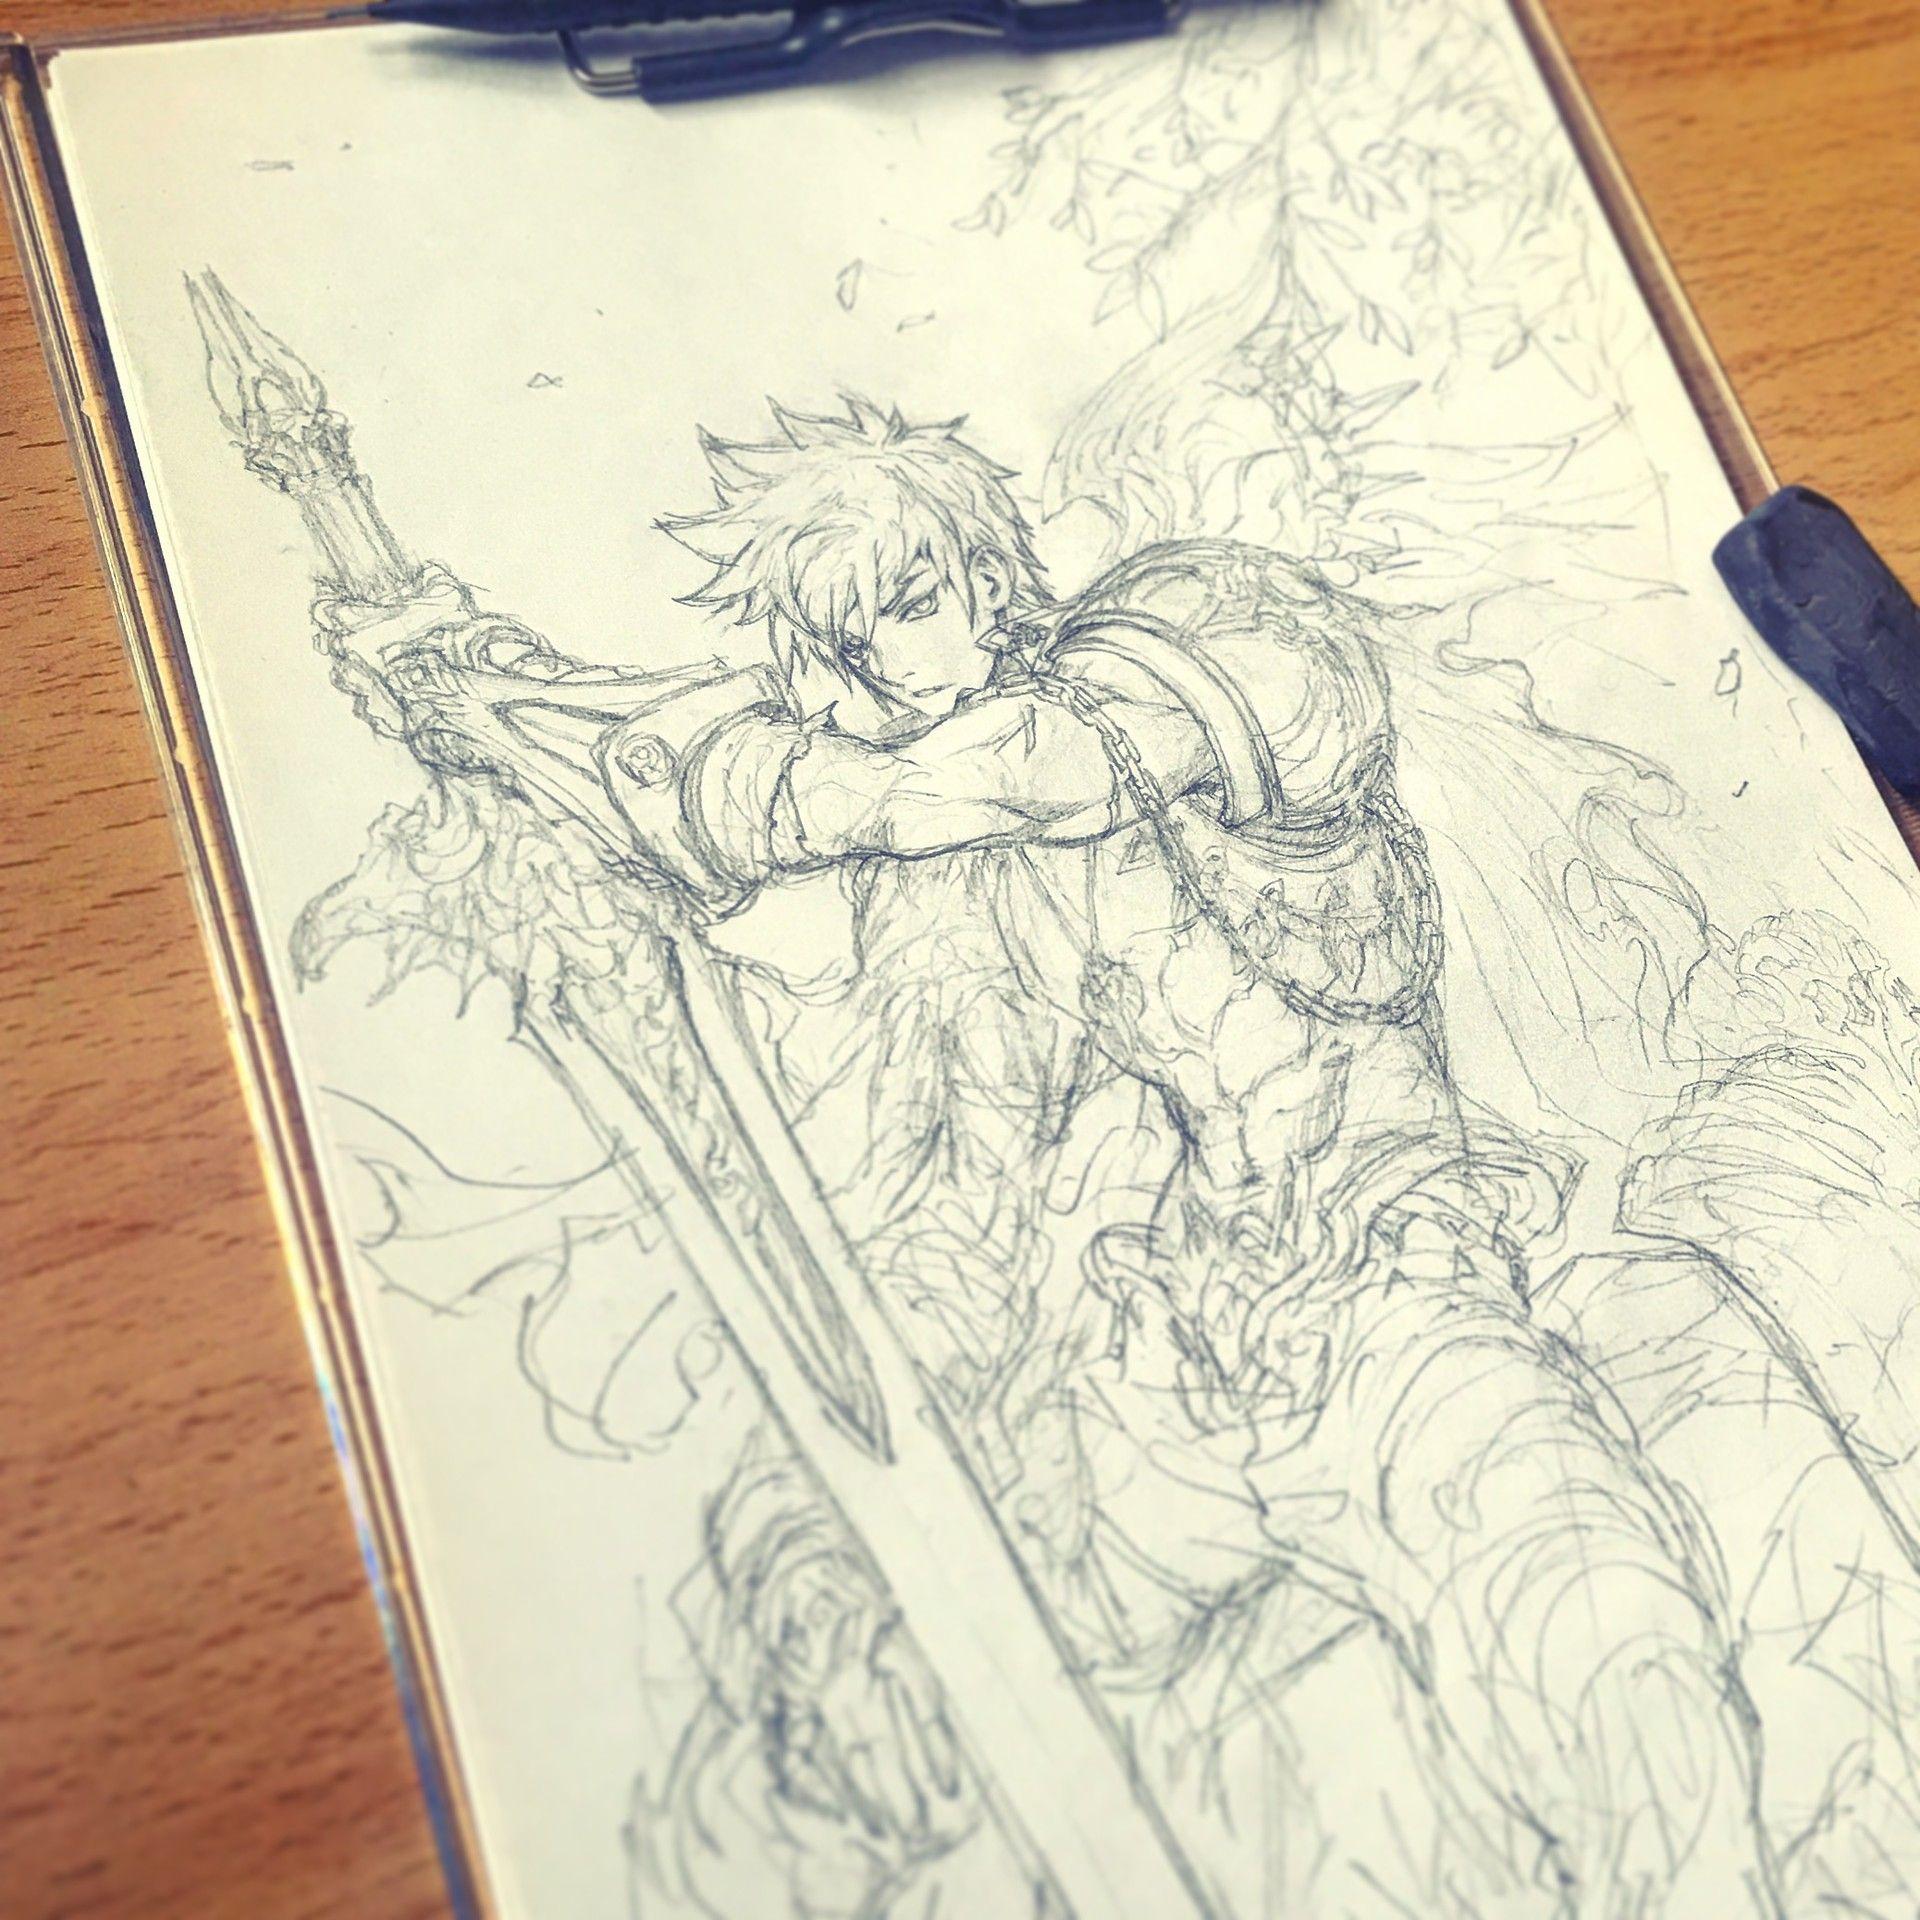 ArtStation - STATO / FANTASY character sketches , Stato Ozo